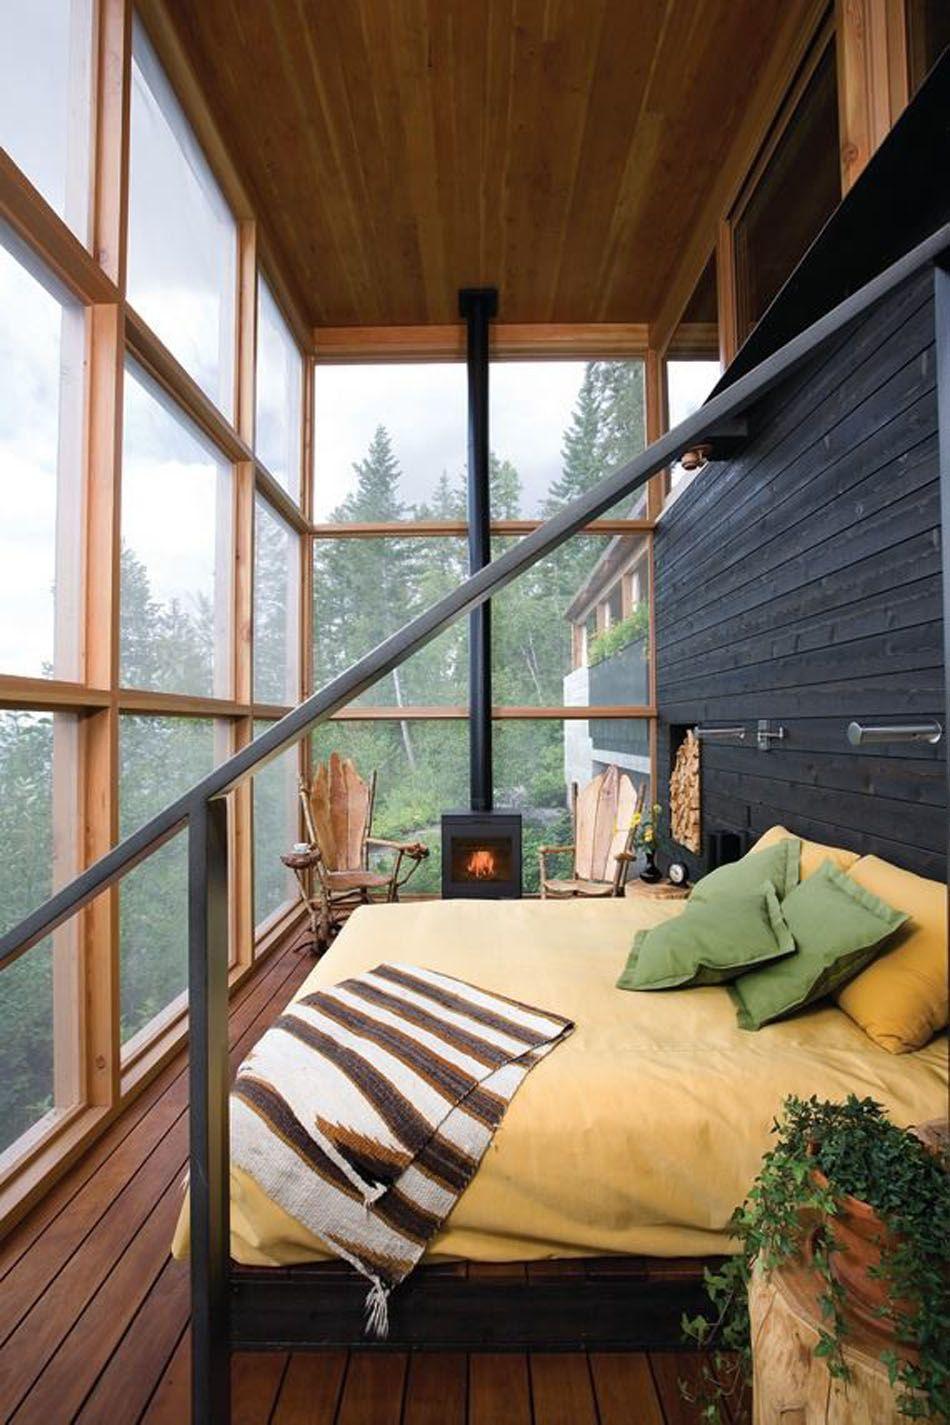 La veranda moderne transform e en coin de sommeil estival for Chambre a coucher entiere